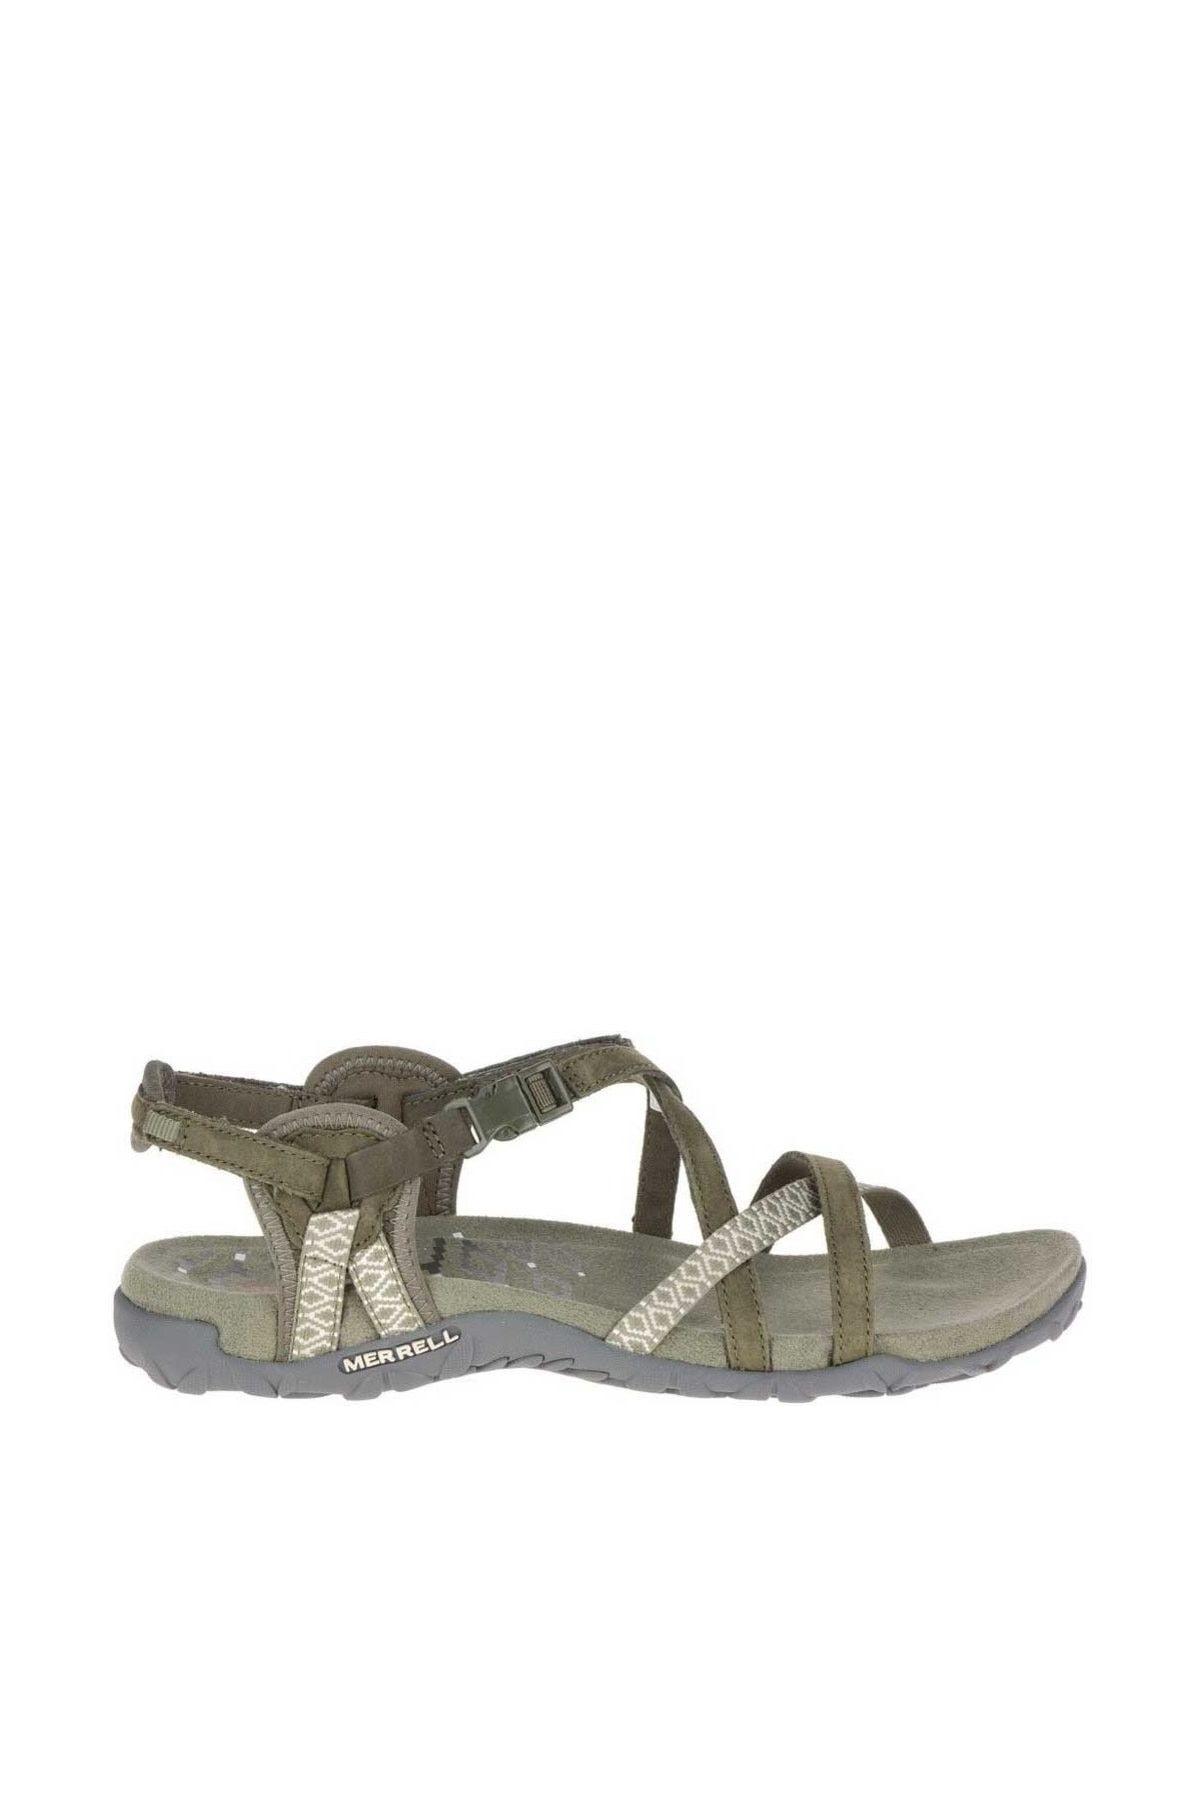 Merrell Dusty Olive Kadın Sandalet J98756 2